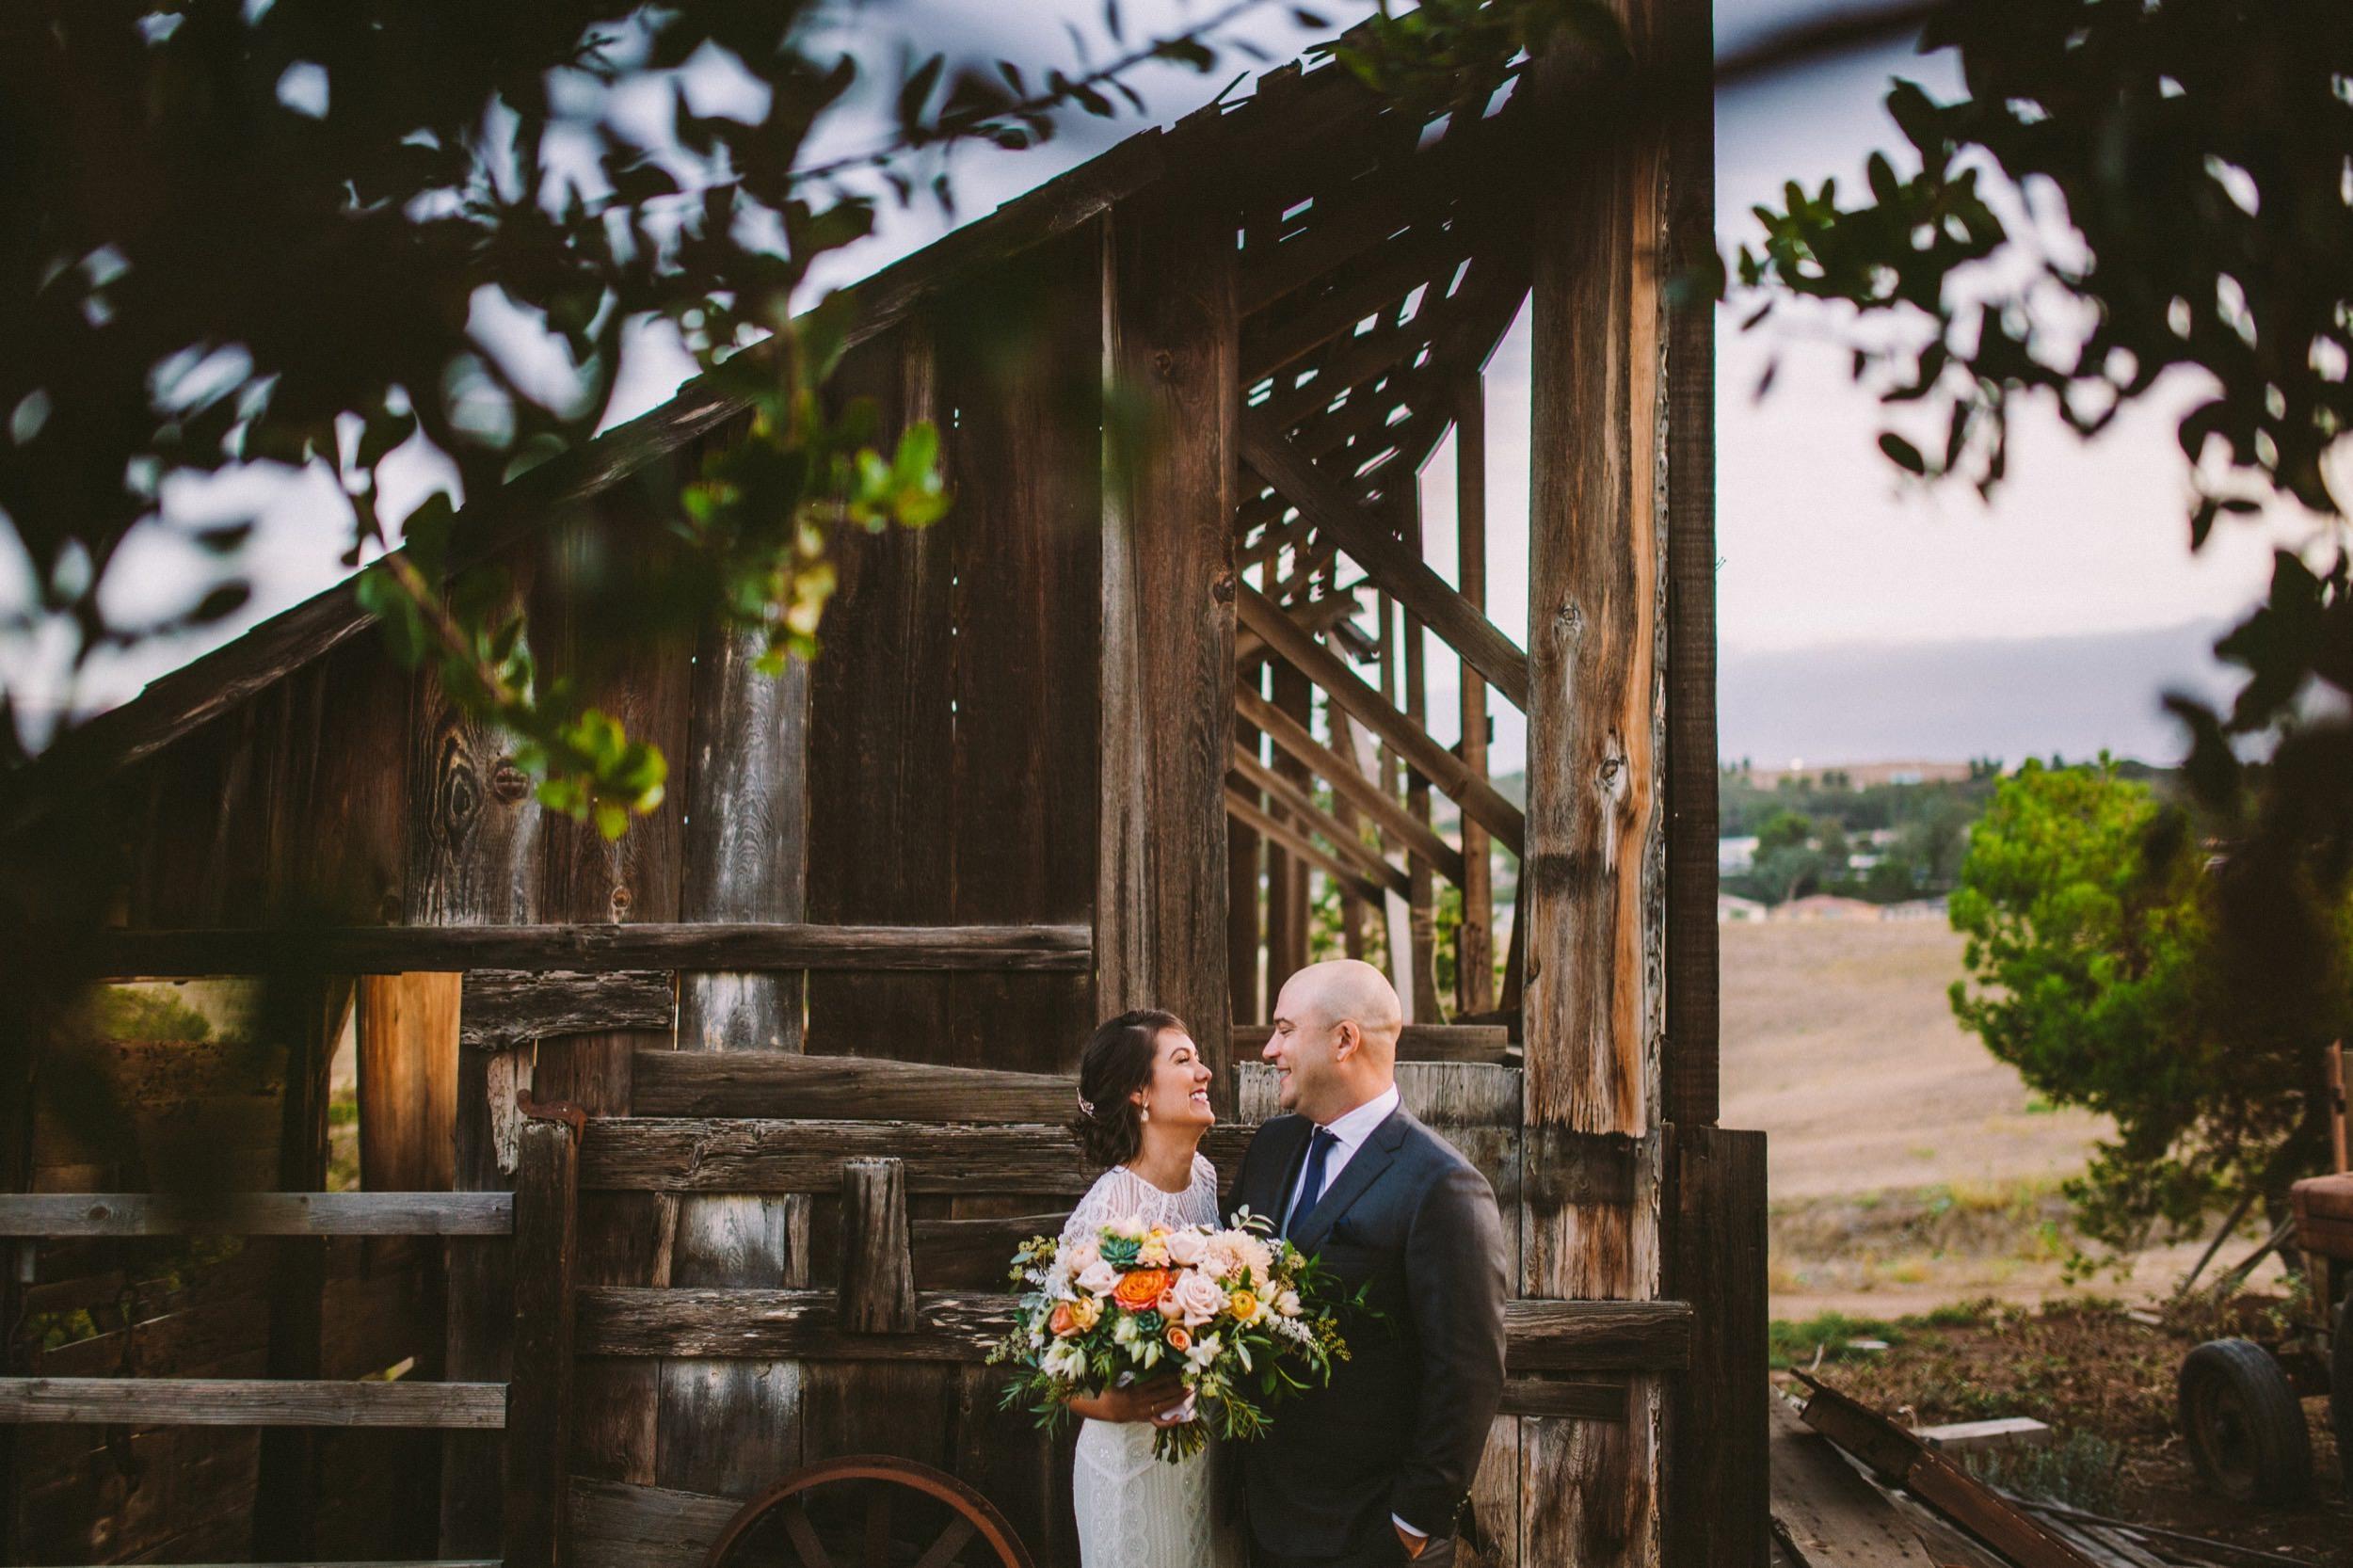 Rustic Barn Wedding in Carlsbad Ranch